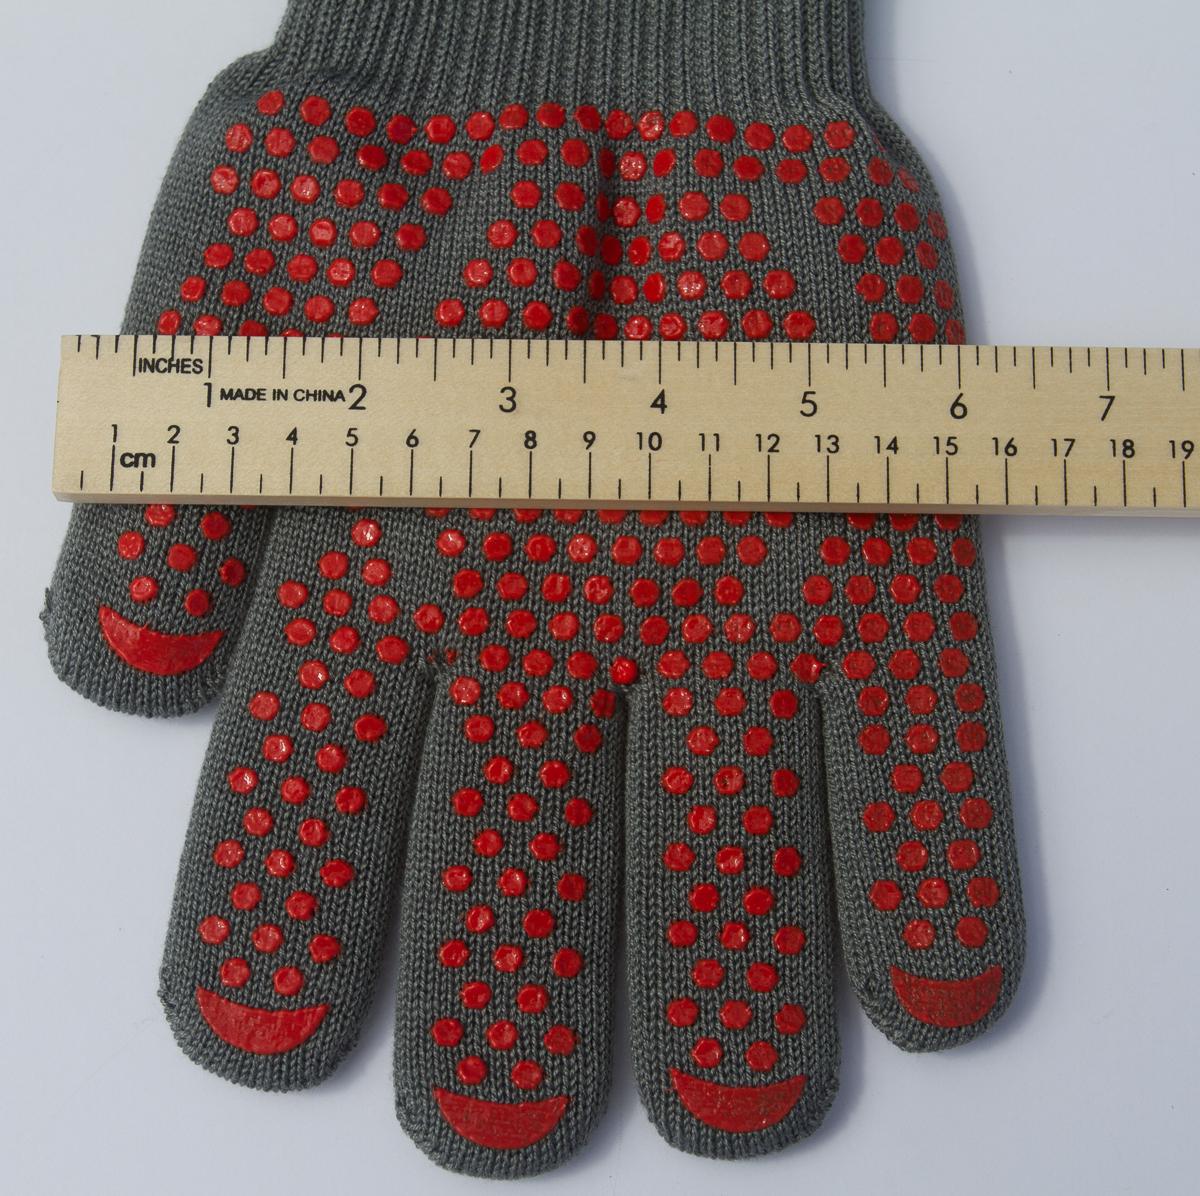 Glove_Box_measurments-218T.jpg